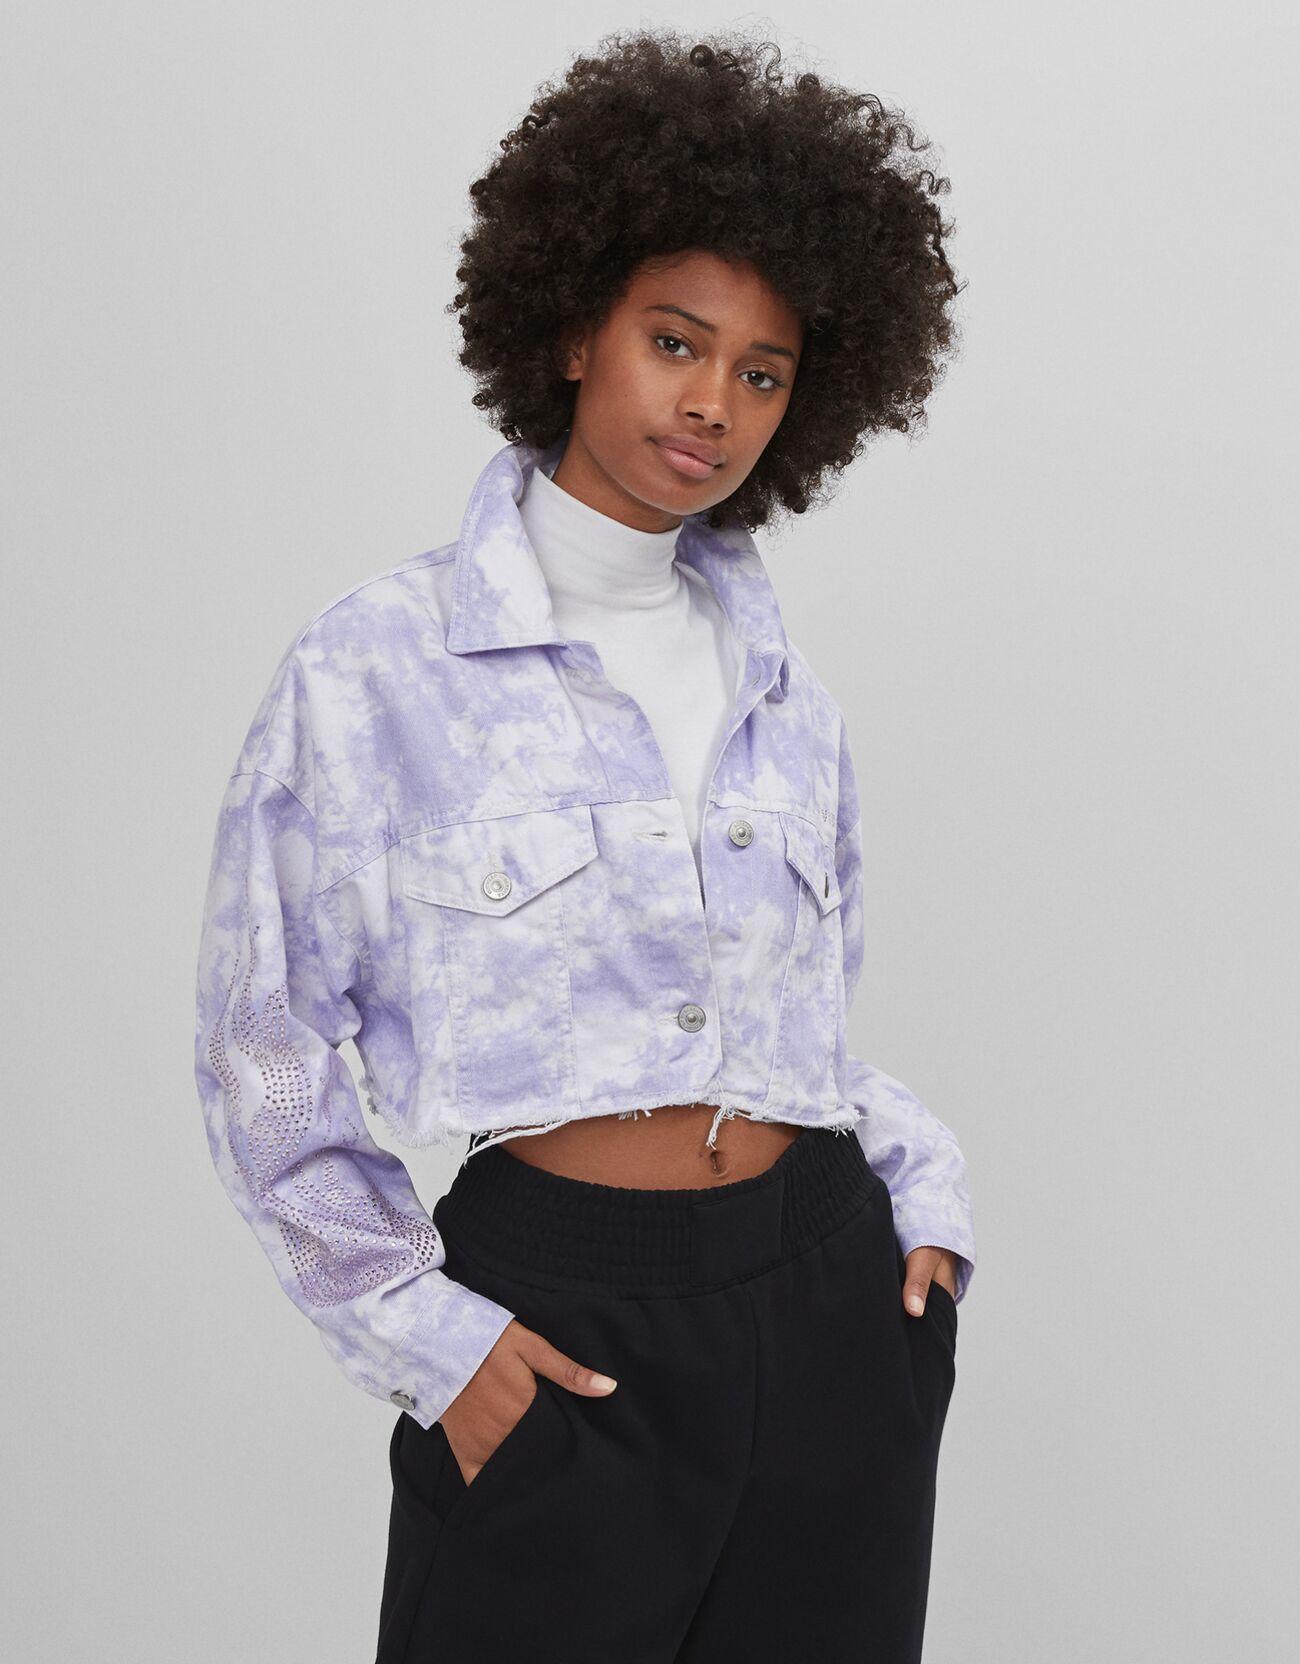 bershka - Cropped-Jacke mit Tie-Dye-Print